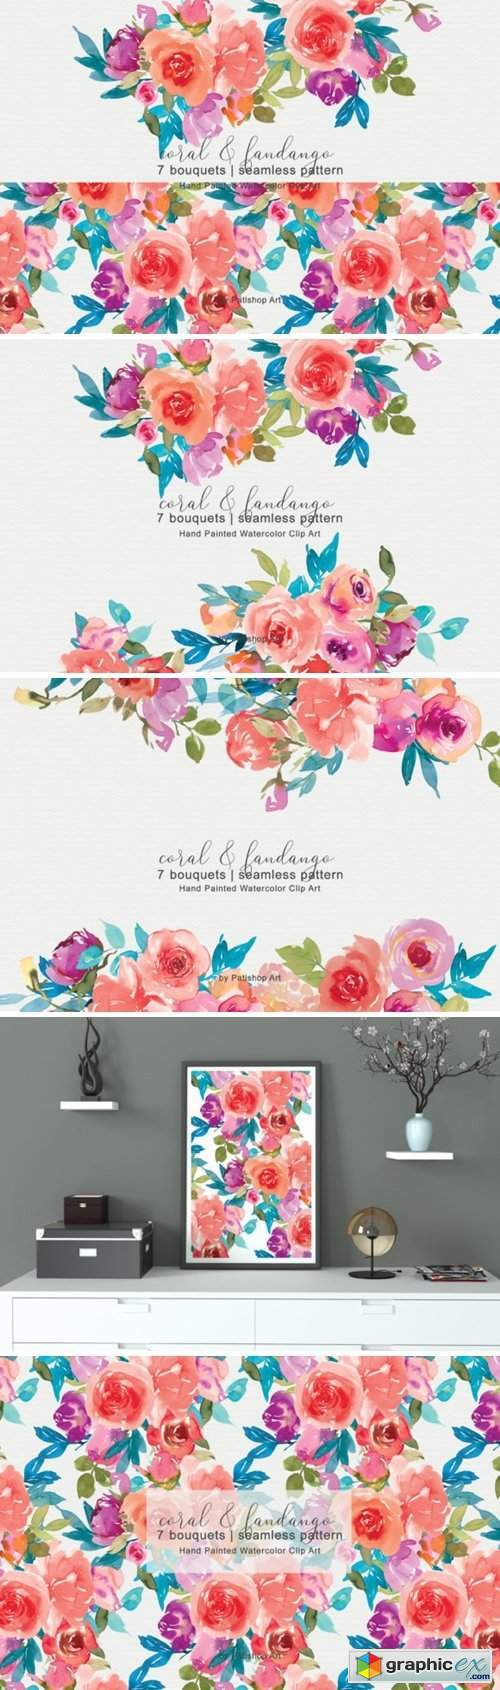 Coral and Fandango Watercolor Set